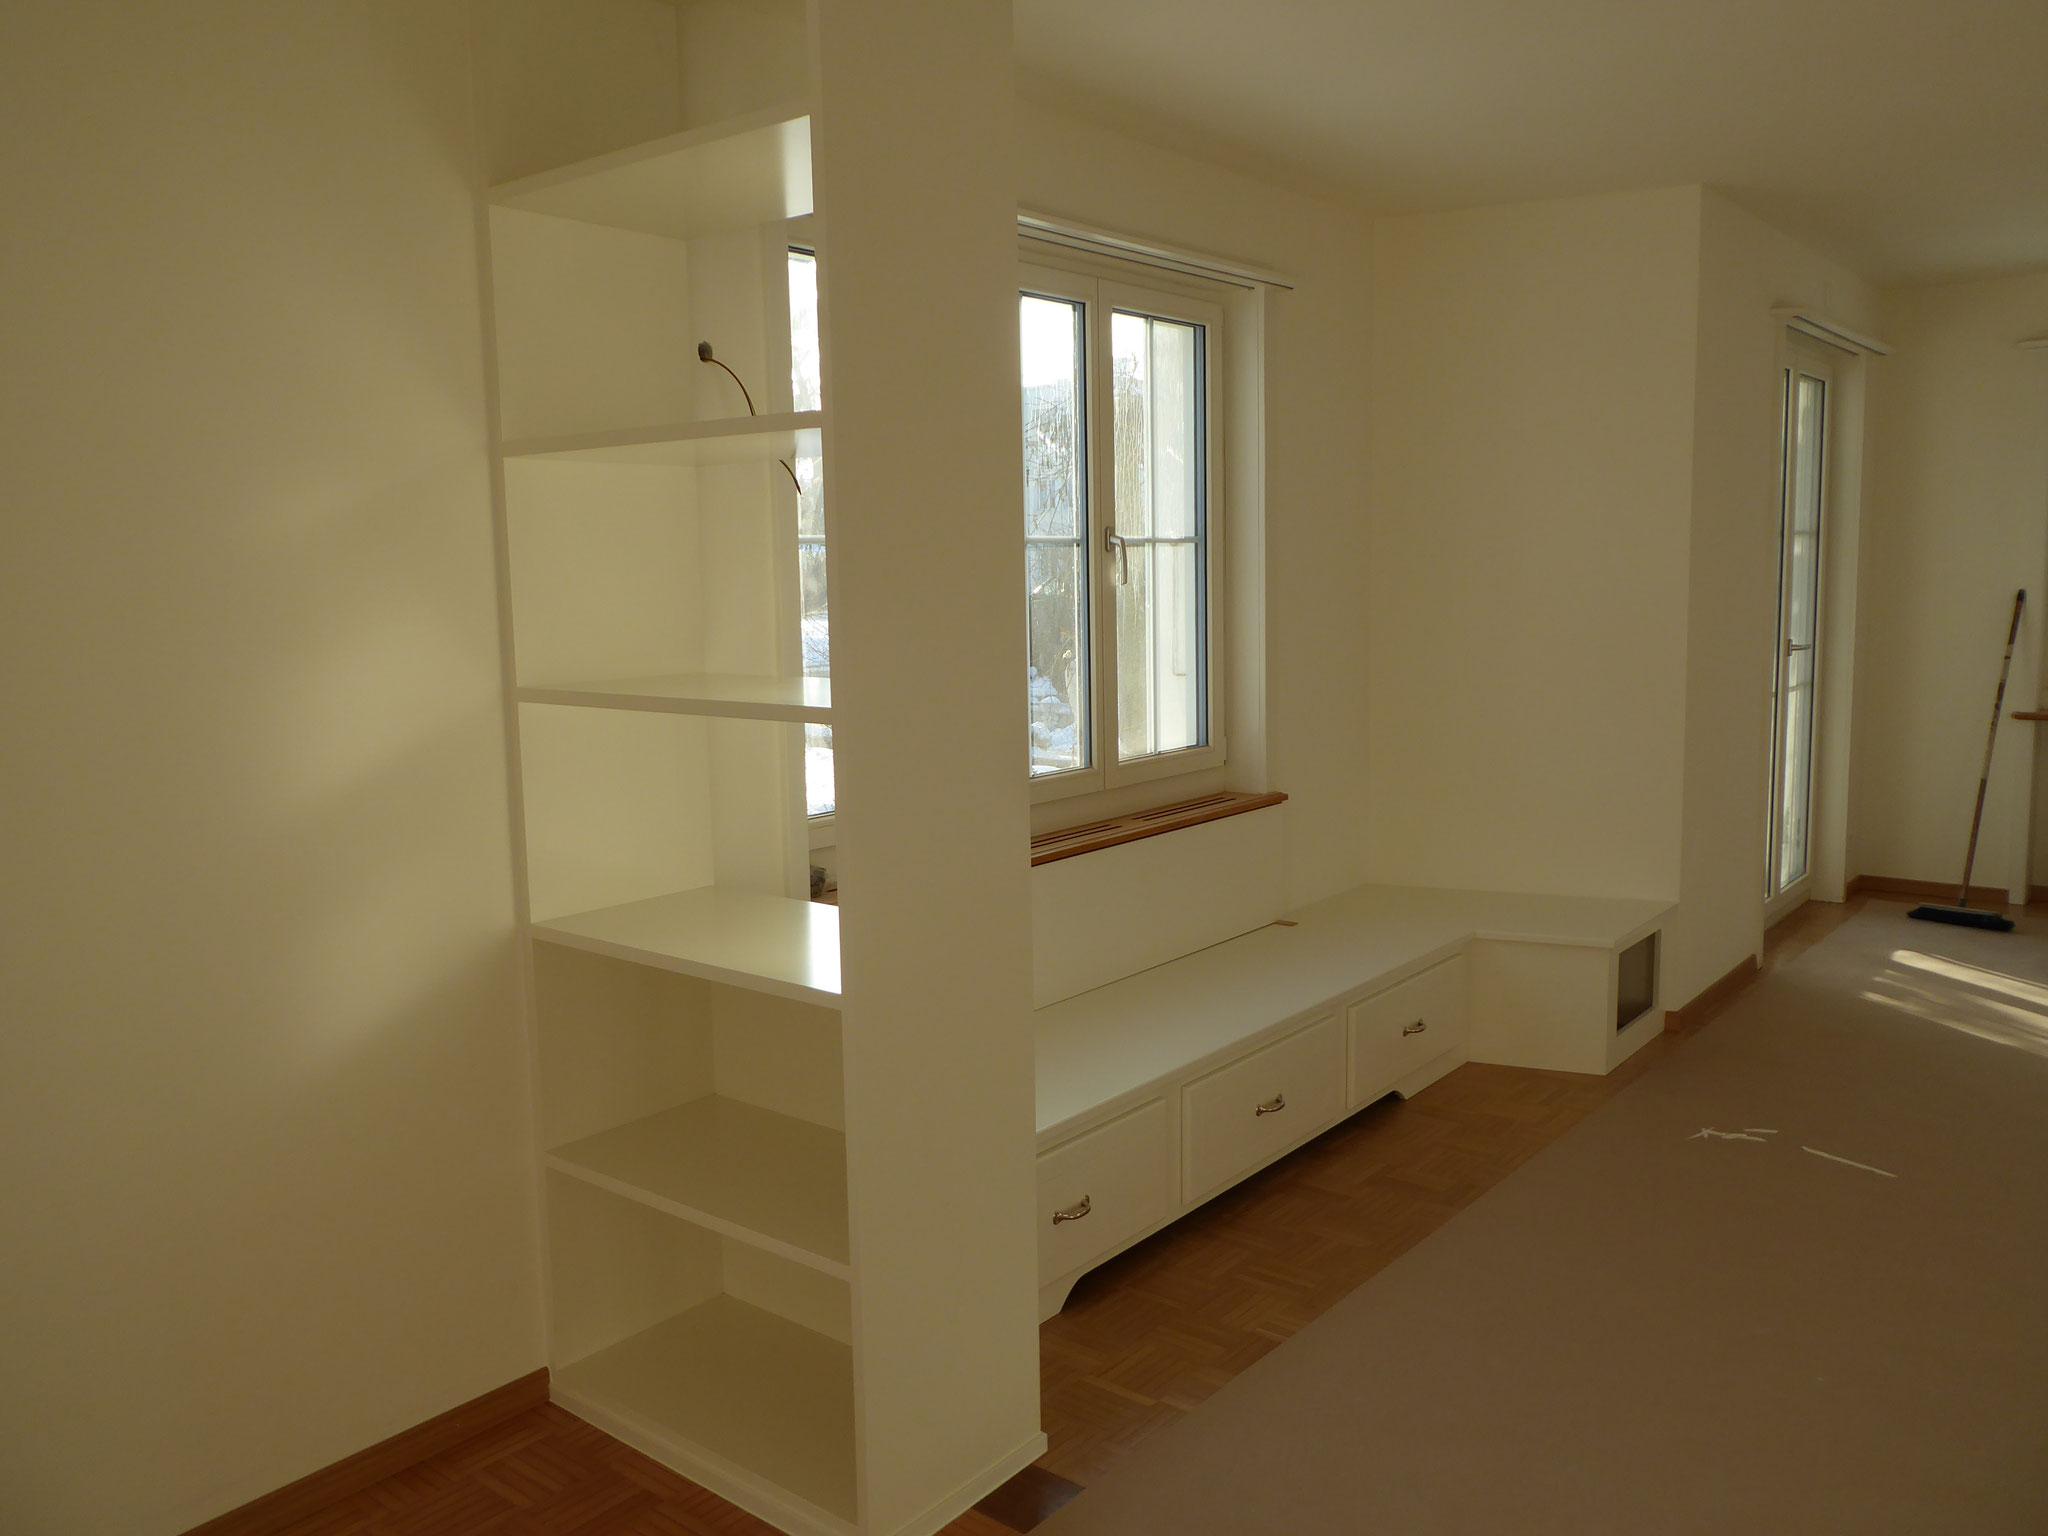 Sitzmöbel mit Büchergestell EFH Zofingan